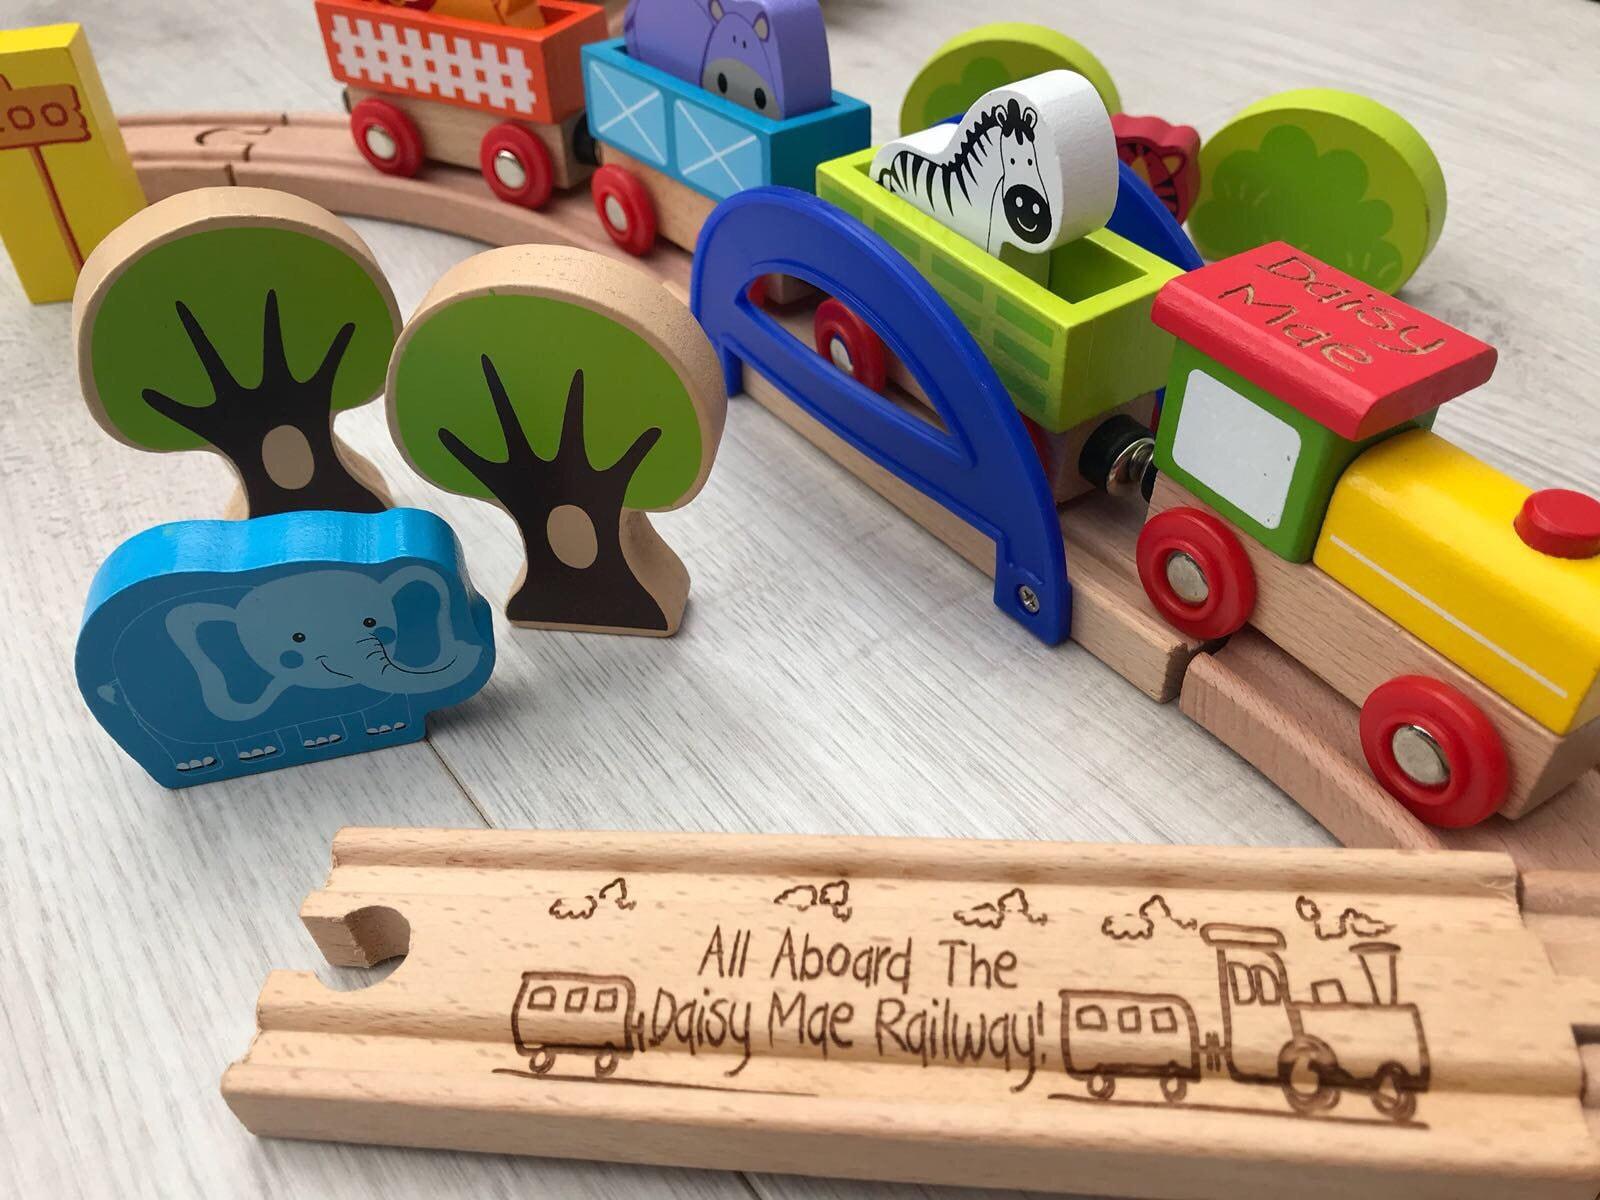 Zoo wooden train set choo choo set personalised wooden train track and train